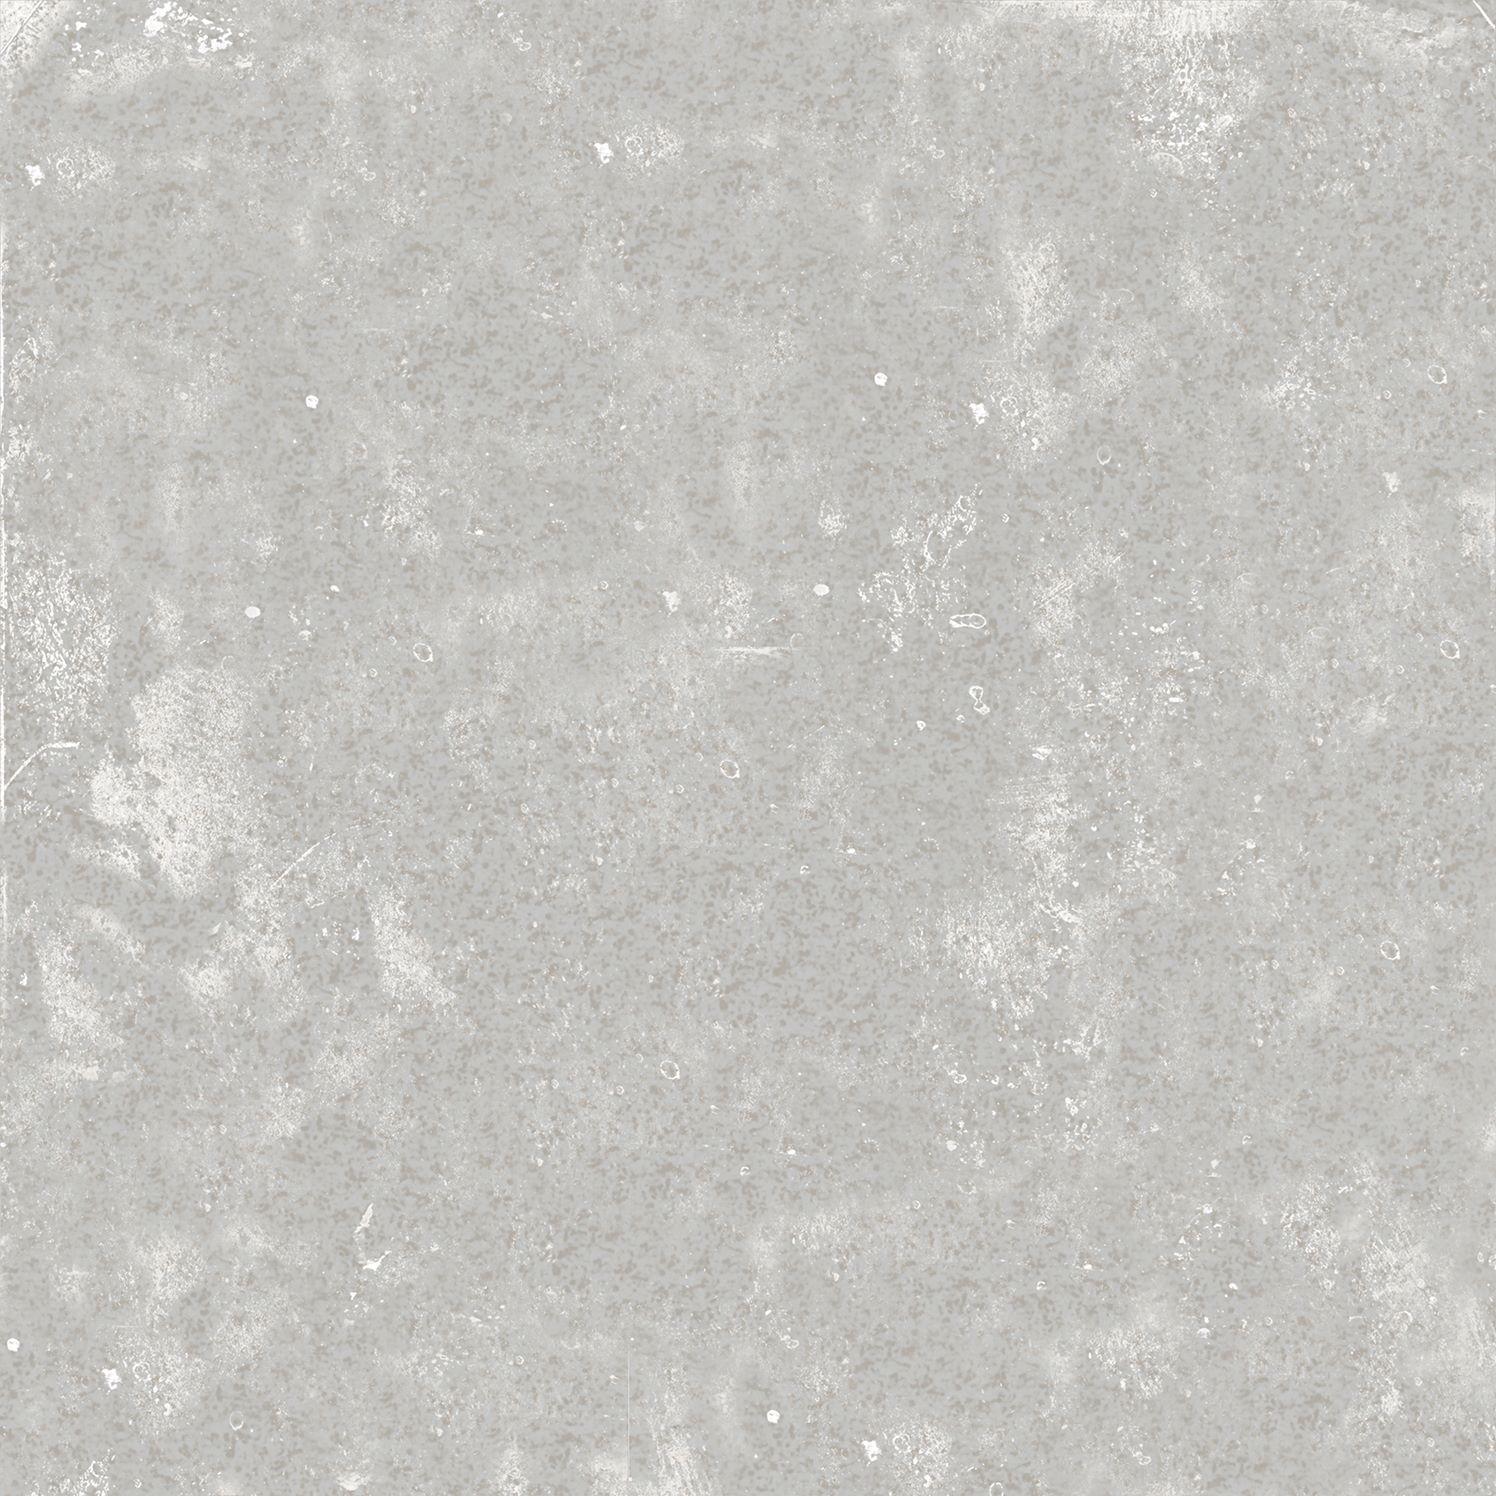 Codicer Evoque Grey 25x25 см